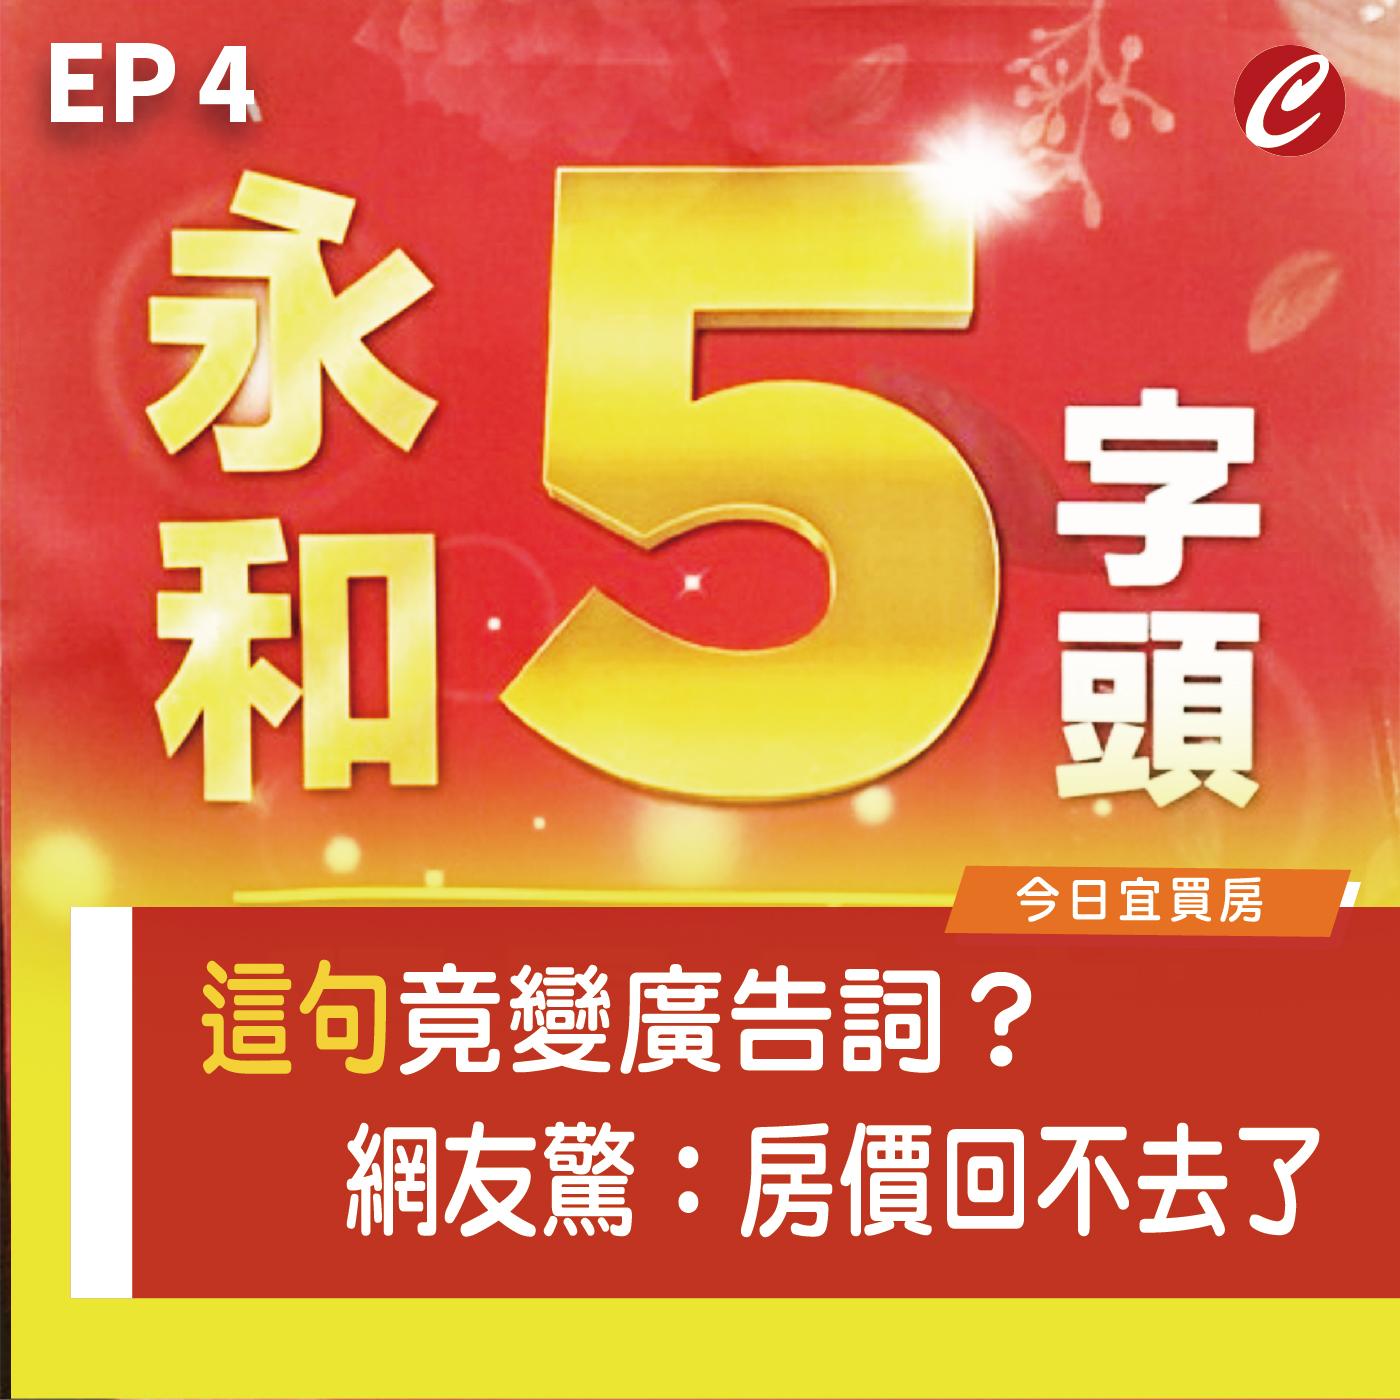 EP4:「永和5字頭」竟成優惠廣告?網友驚:房價回不去了